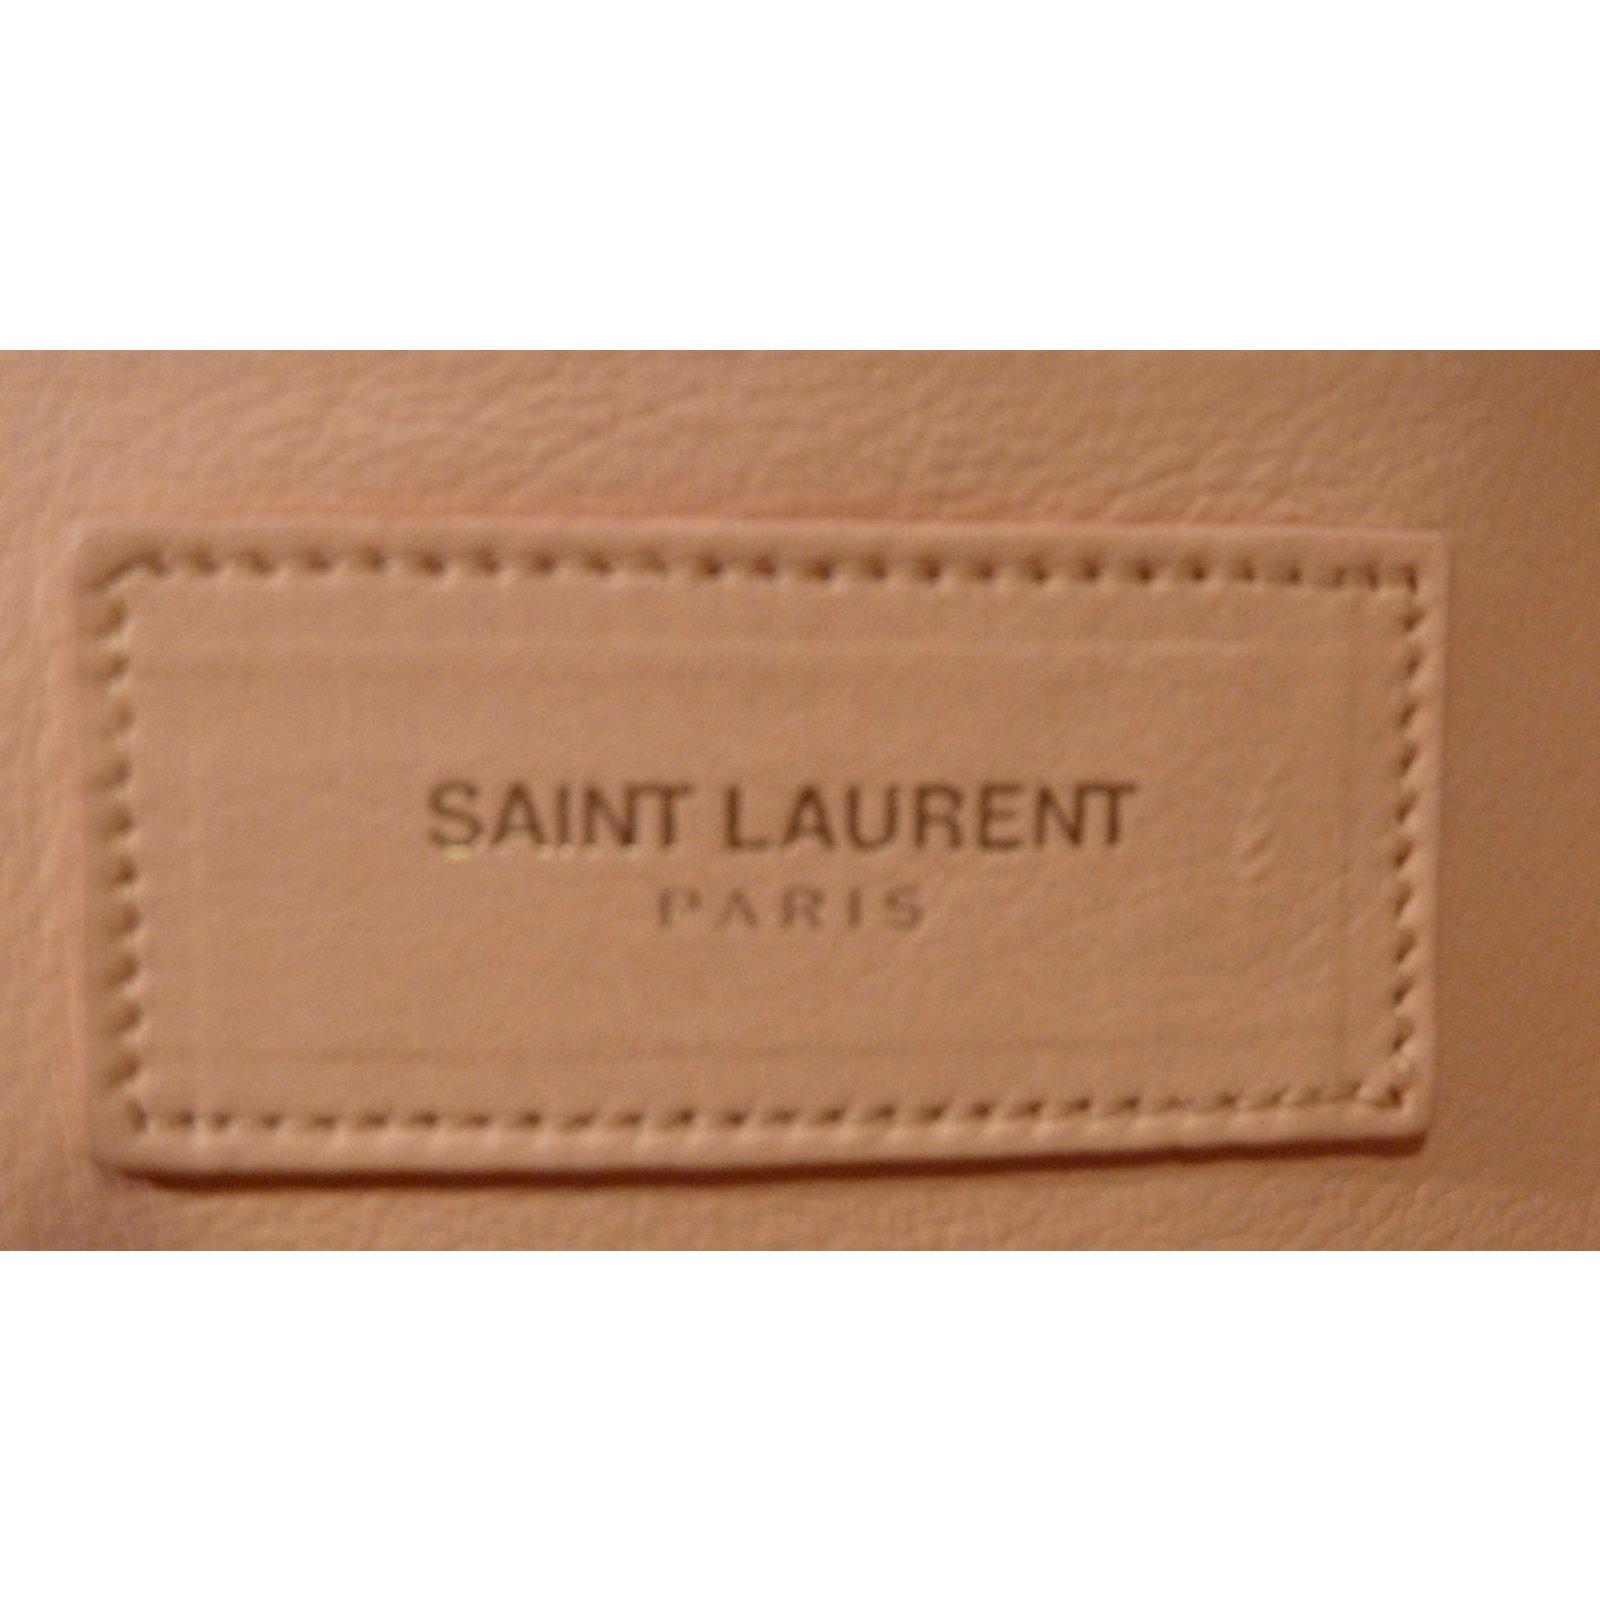 cb32bb4a4e Saint Laurent Small Classic Cabas Handbags Leather Peach ref.58870 - Joli  Closet